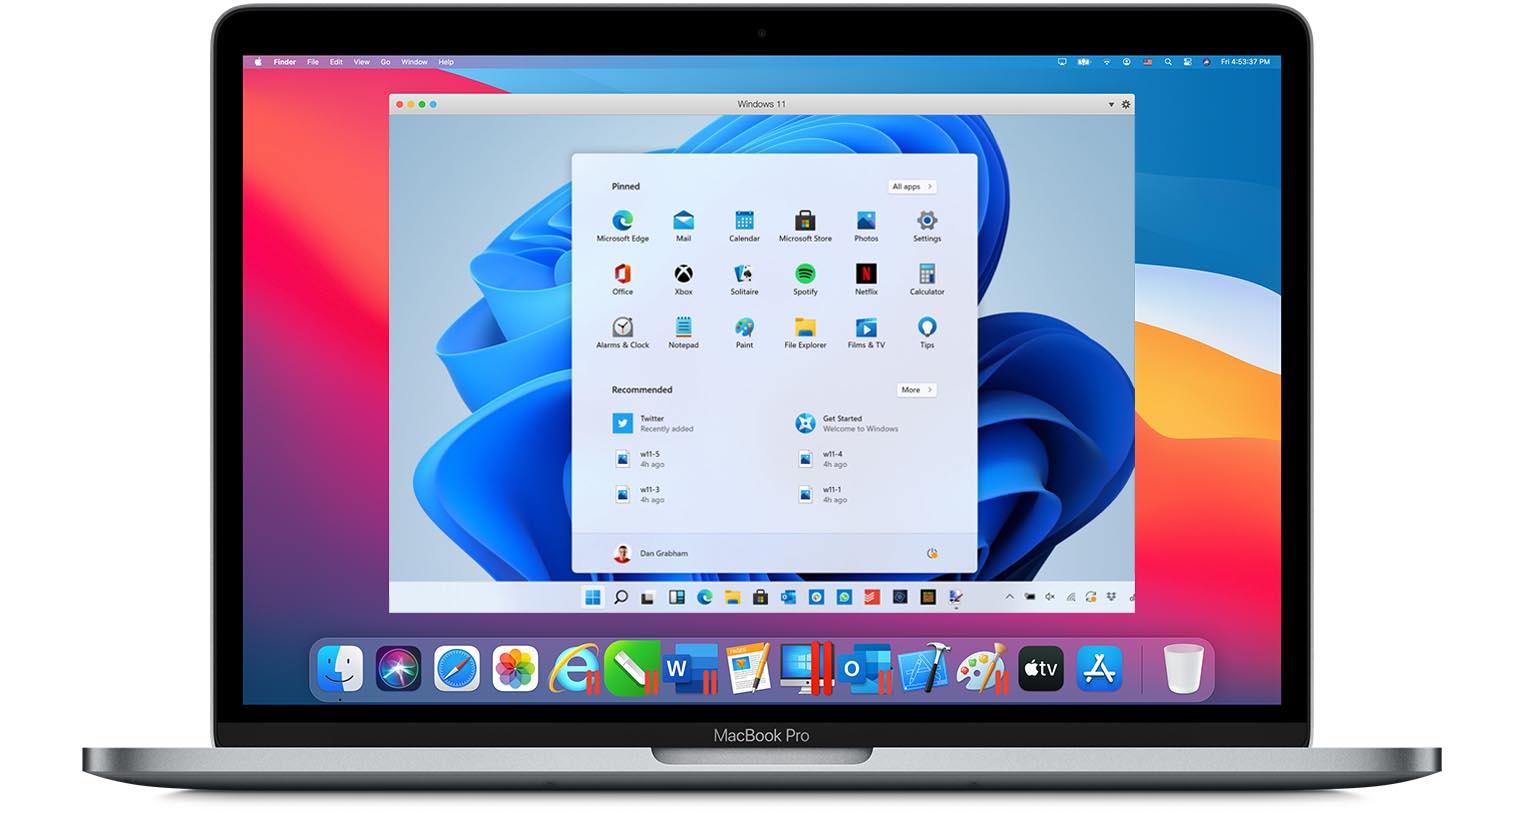 Parallels Windows 11 MacBook Pro